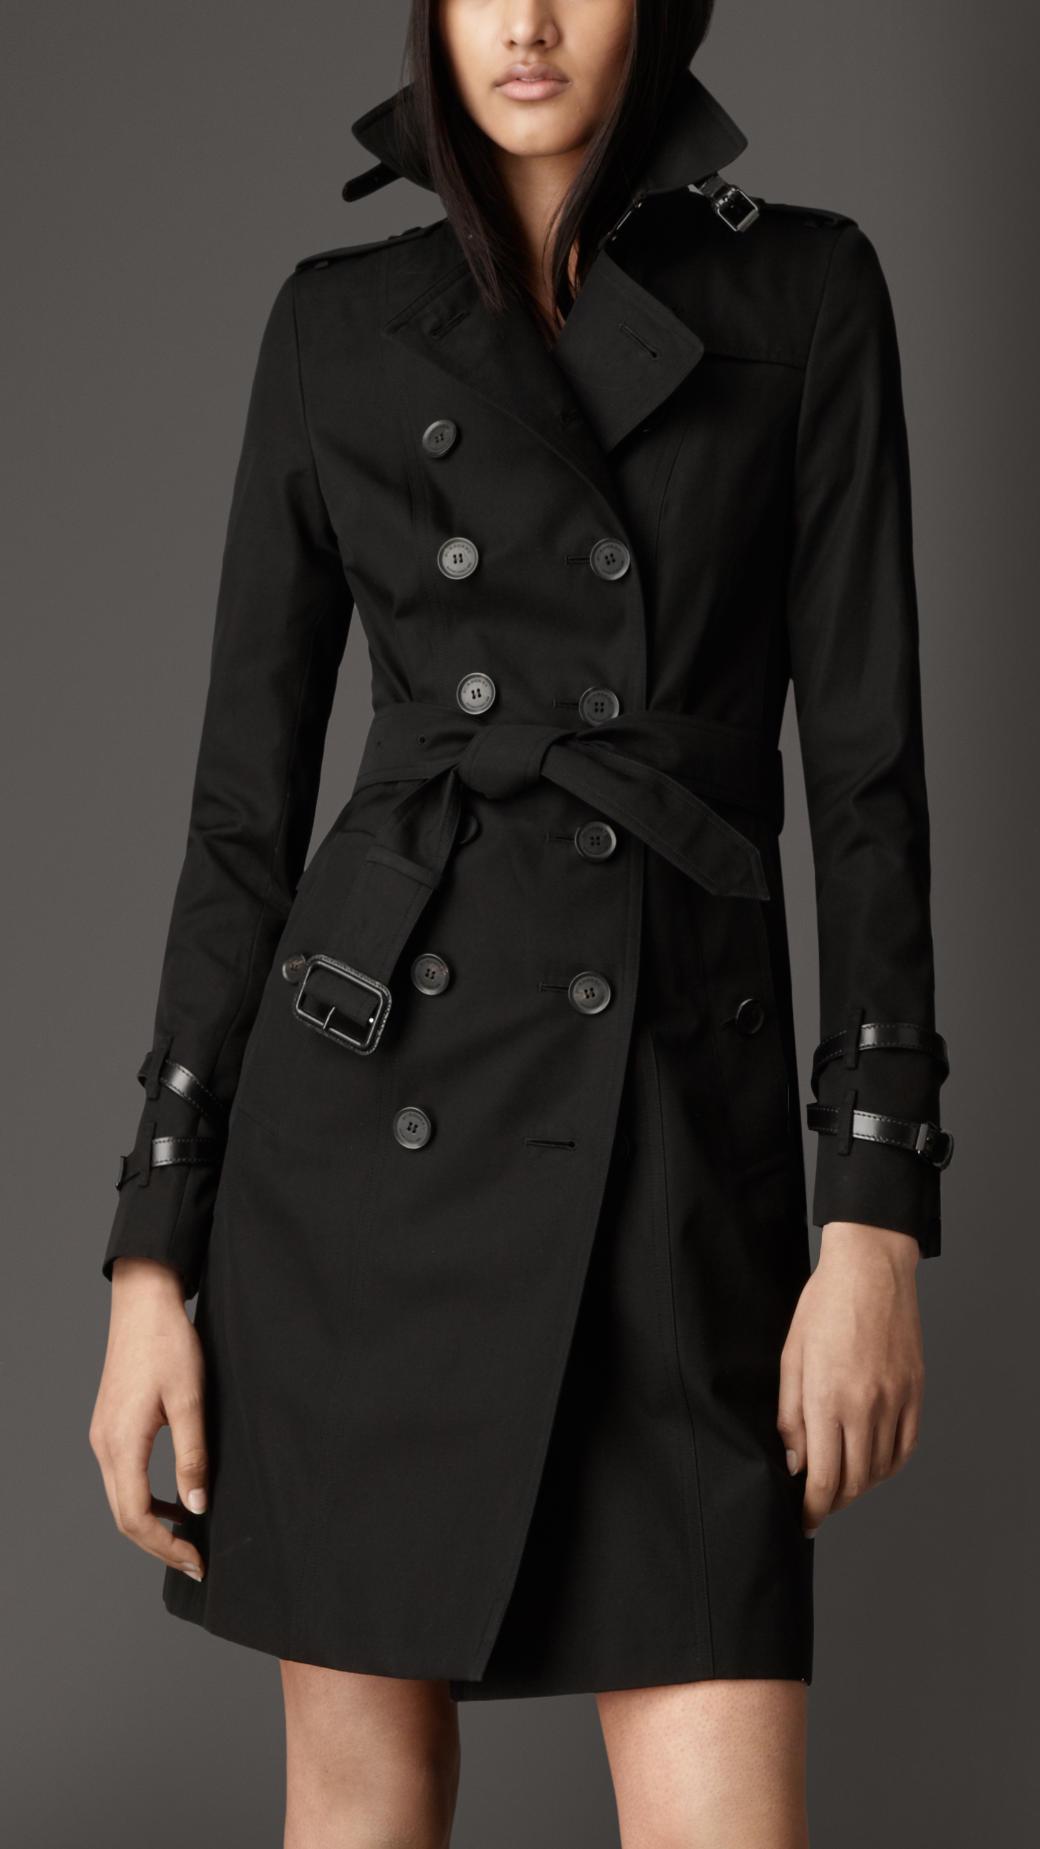 Womens black trench coats